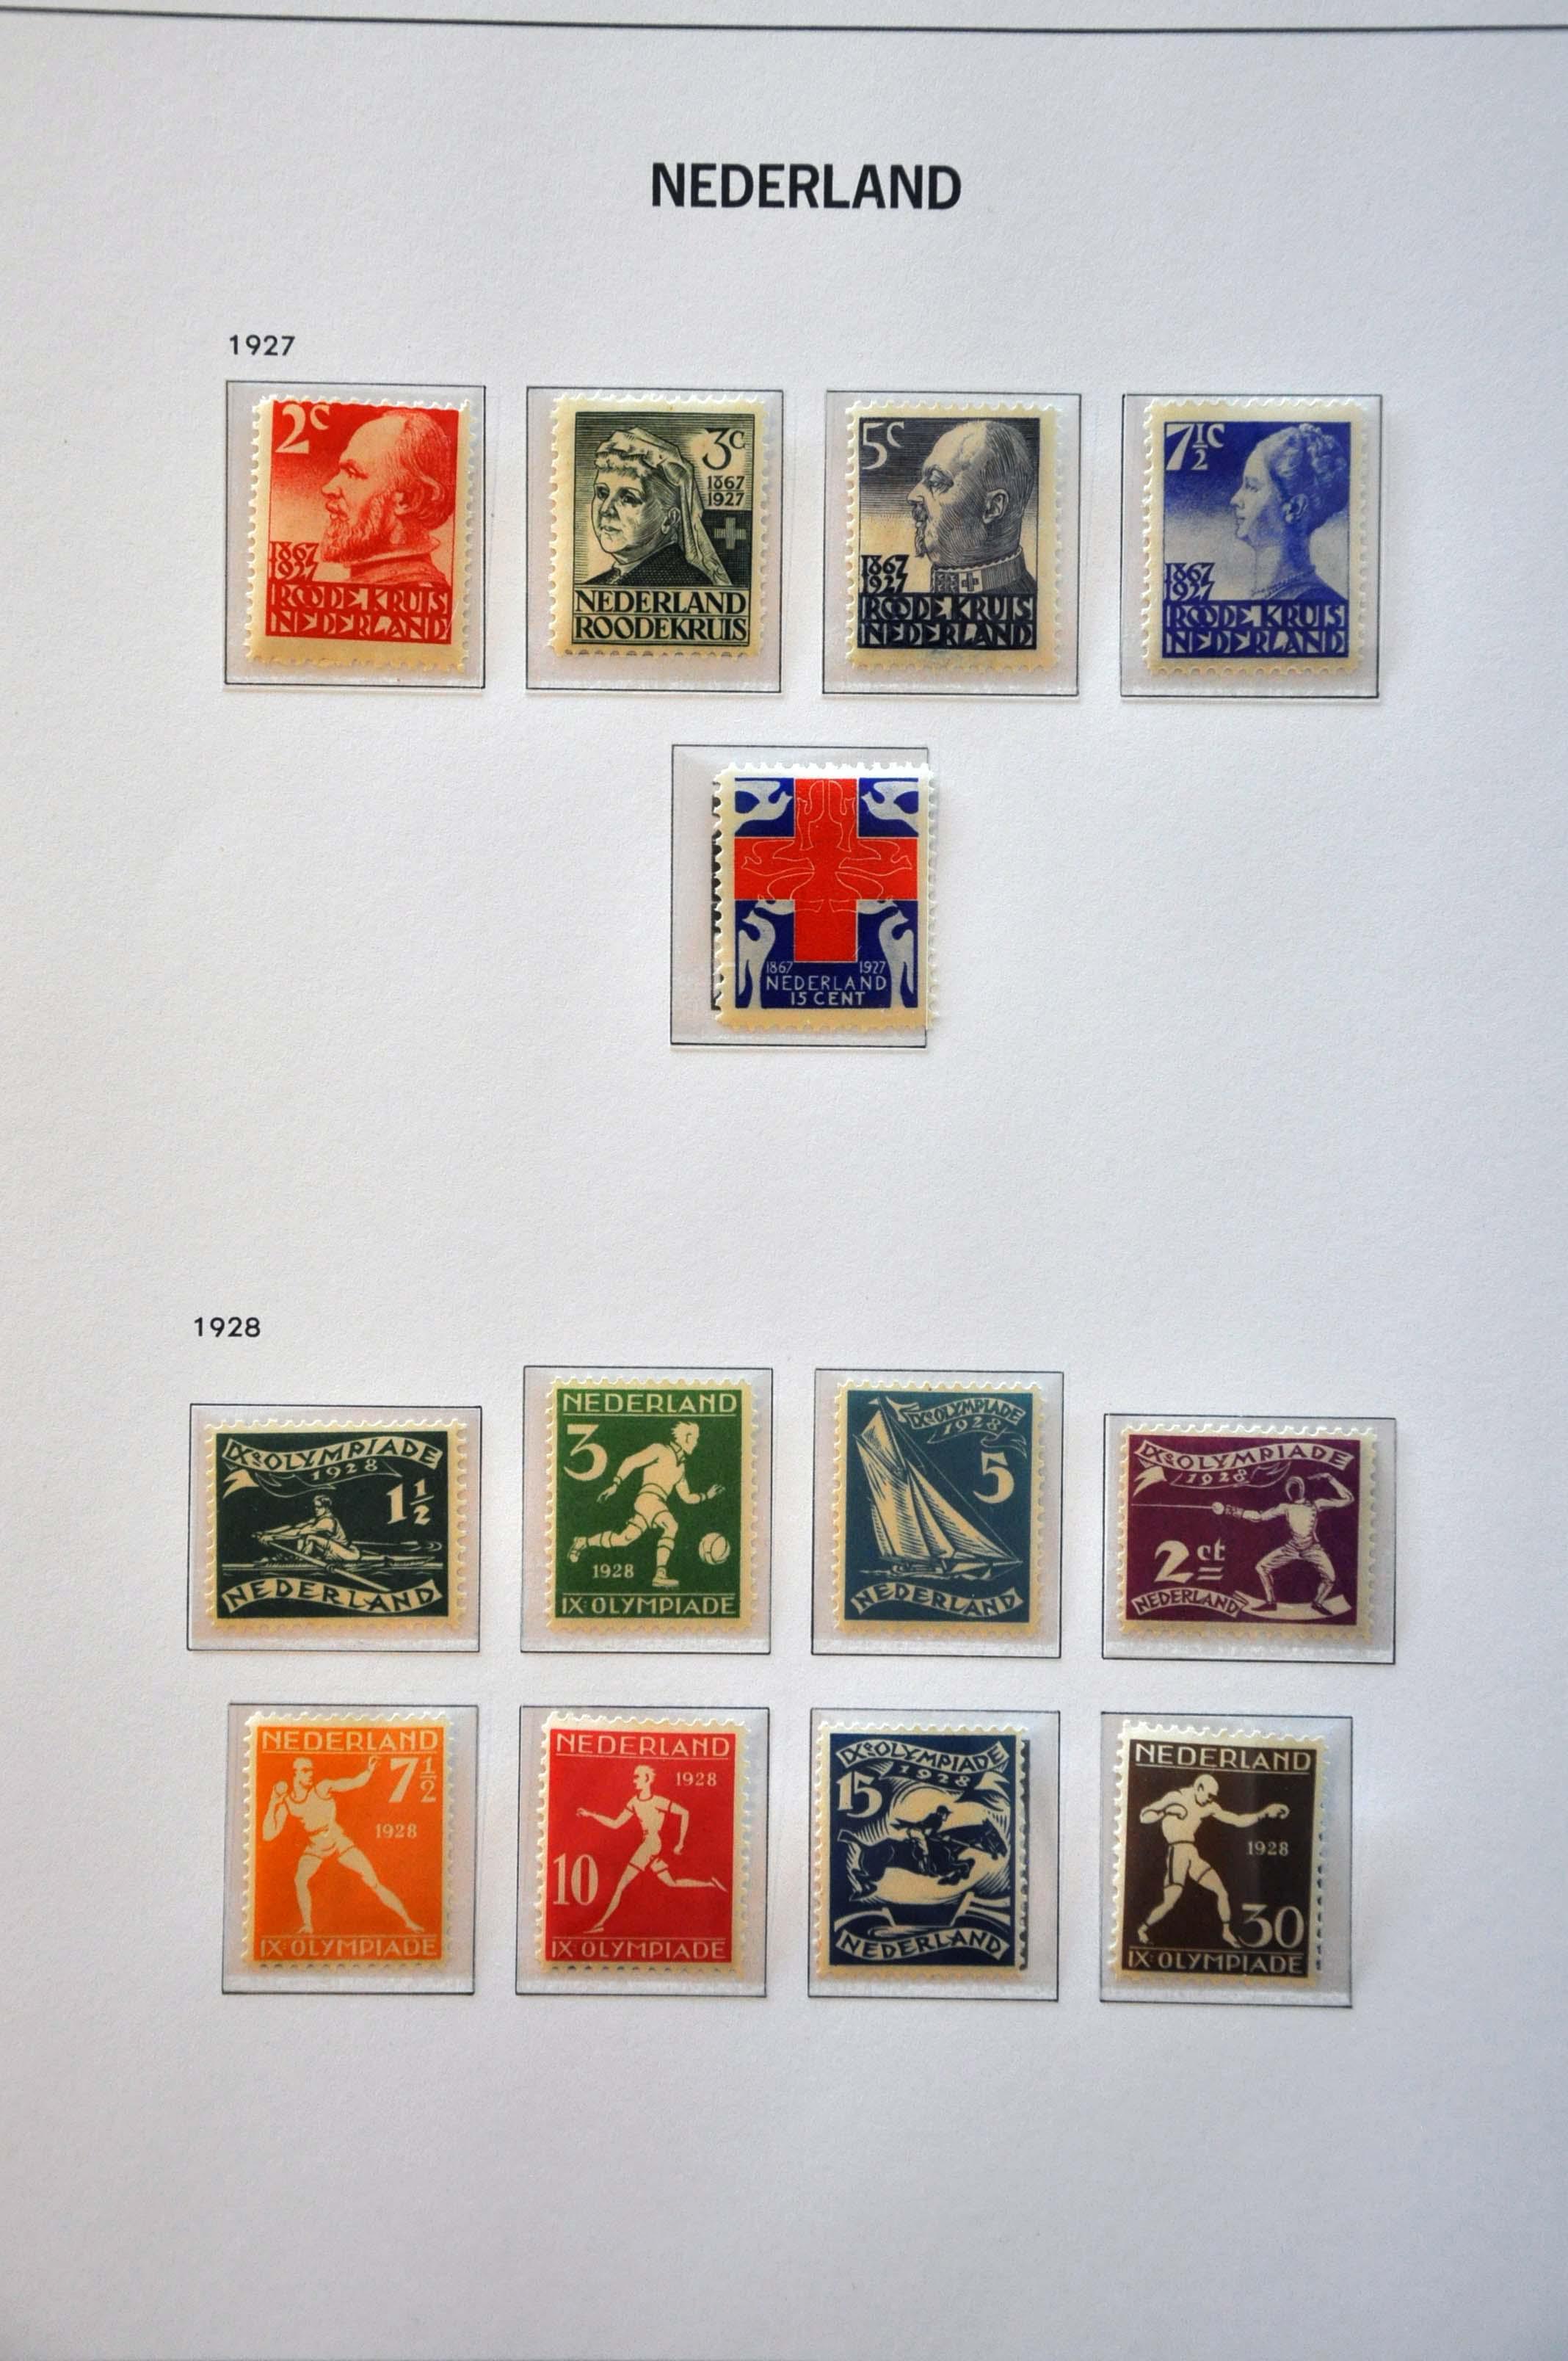 Lot 1499 - Netherlands and former colonies Netherlands -  Corinphila Veilingen Auction 239: General sale